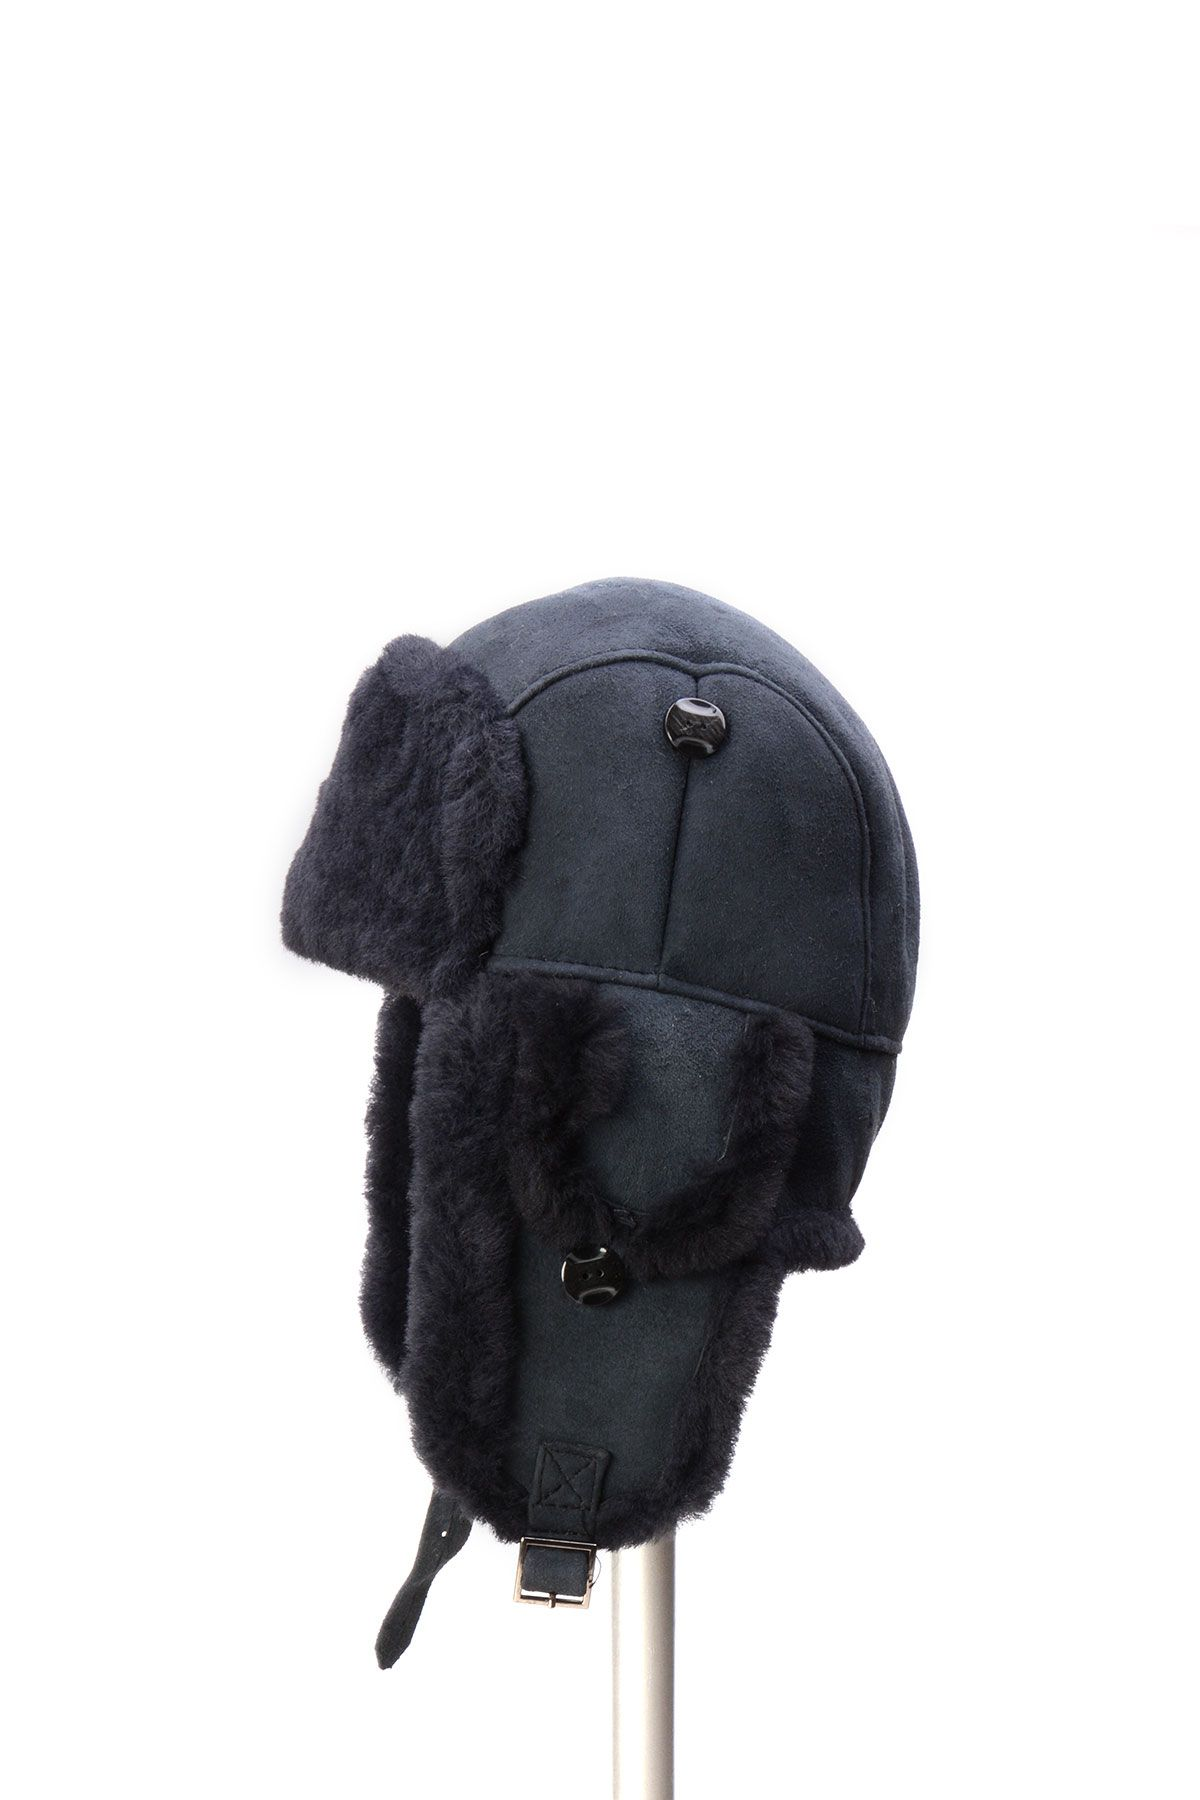 Pegia Hakiki Kürklü Şapka 19SB01 Lacivert